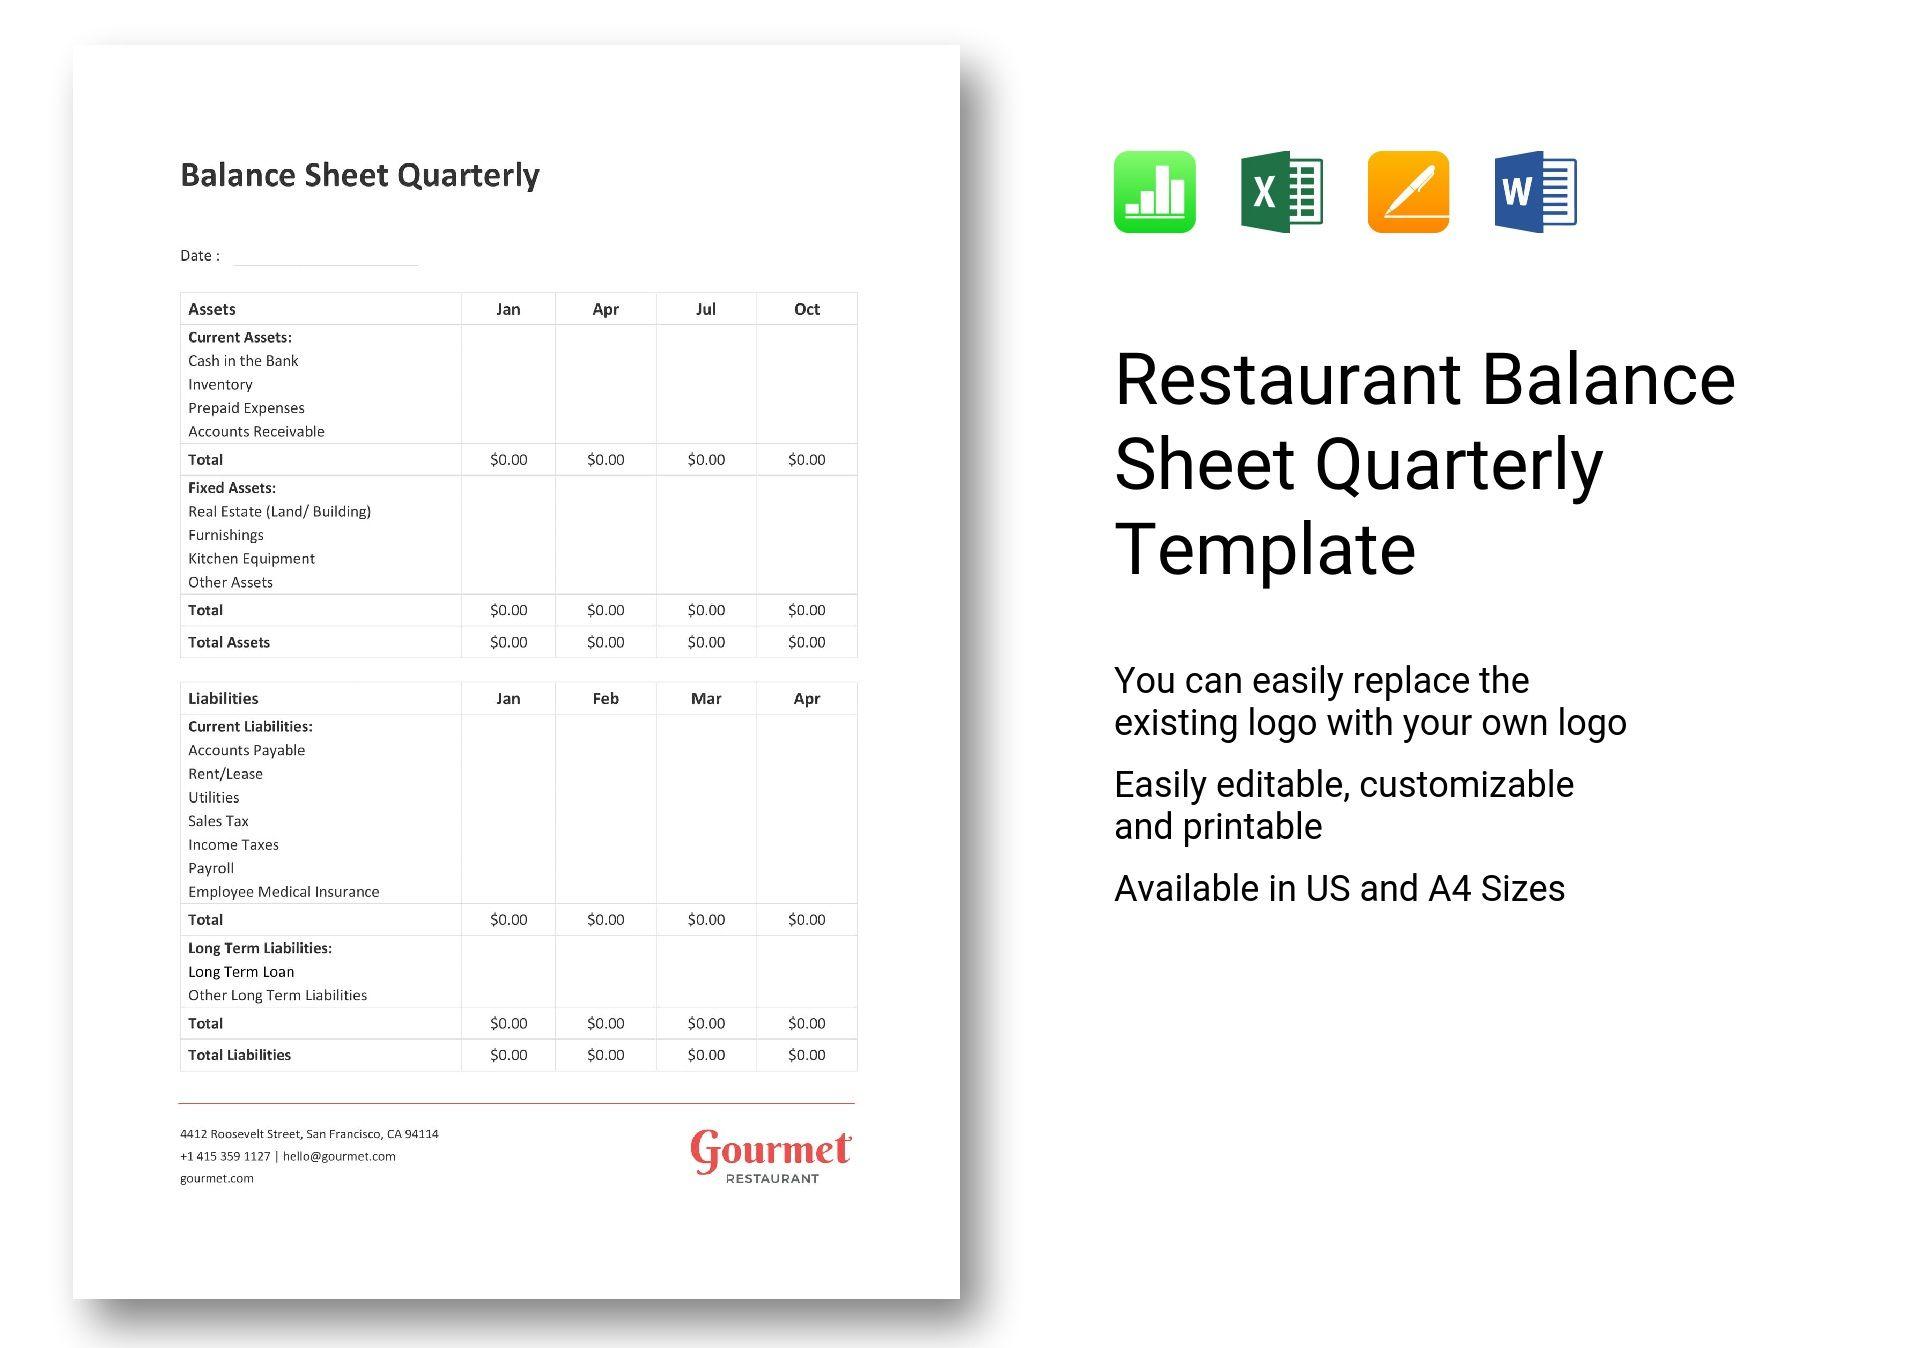 Restaurant Balance Sheet Quarterly